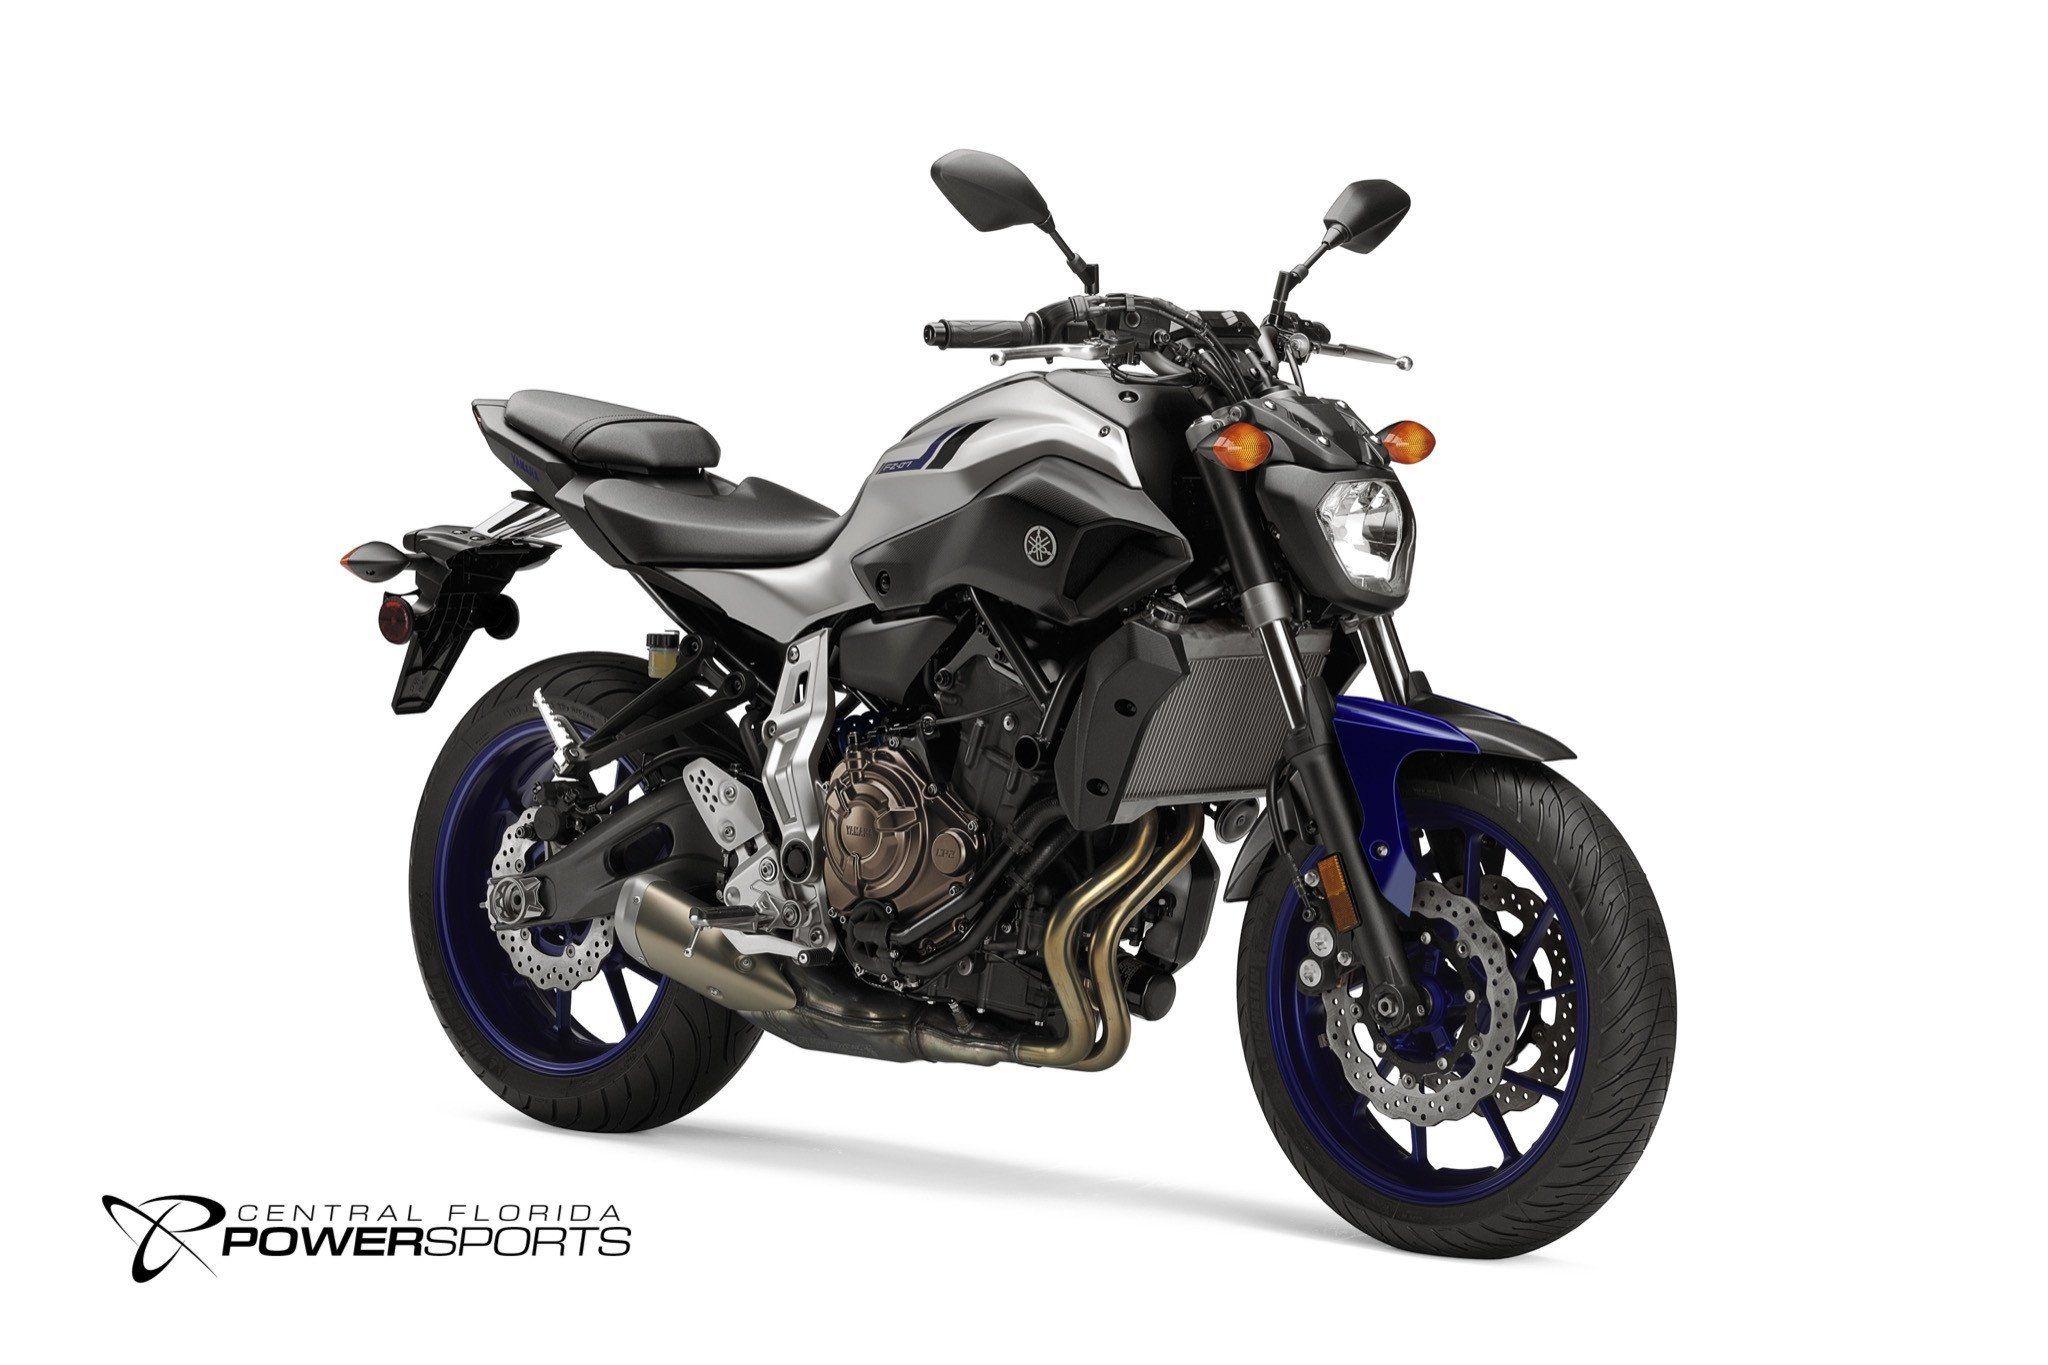 2016 Yamaha FZ07 Motorcycle For Sale Kissimmee